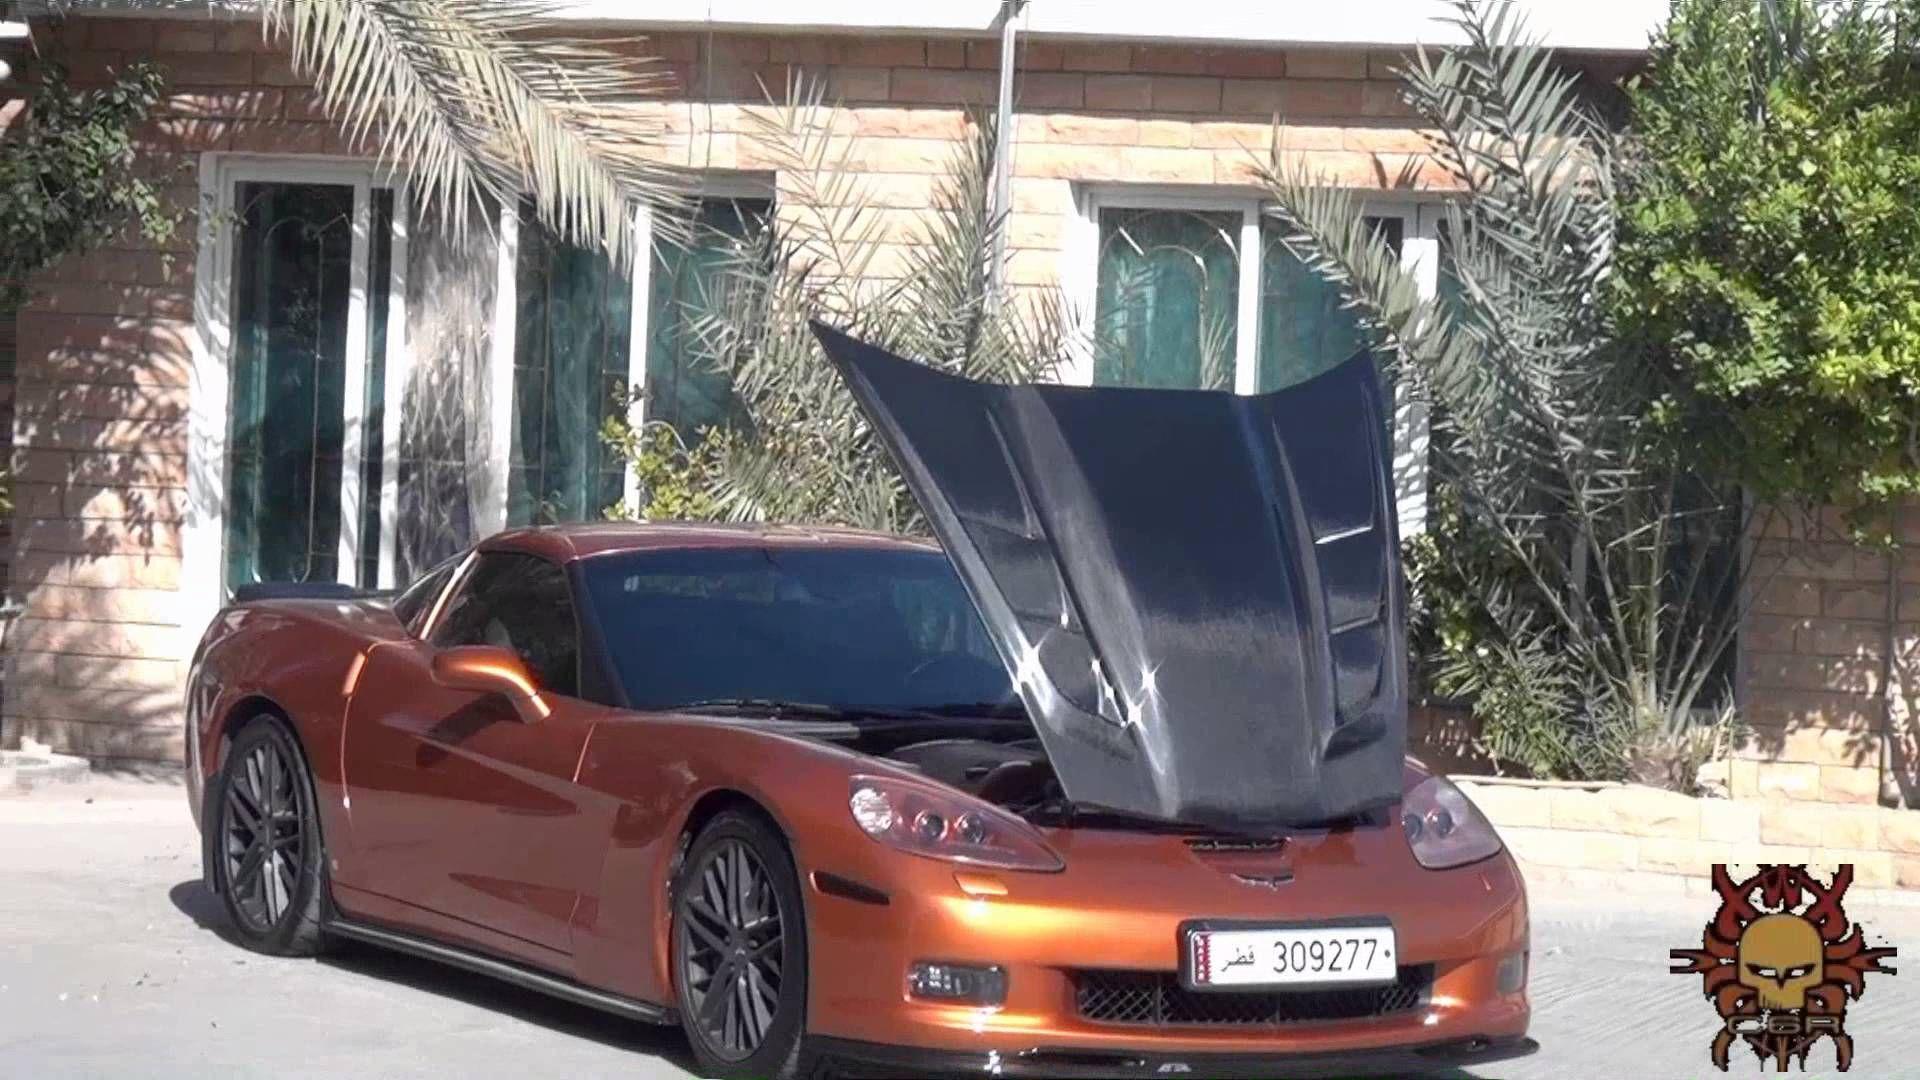 C6 Corvette - Atomic Orange Cammed (C6 R)   Corvettes That Rock